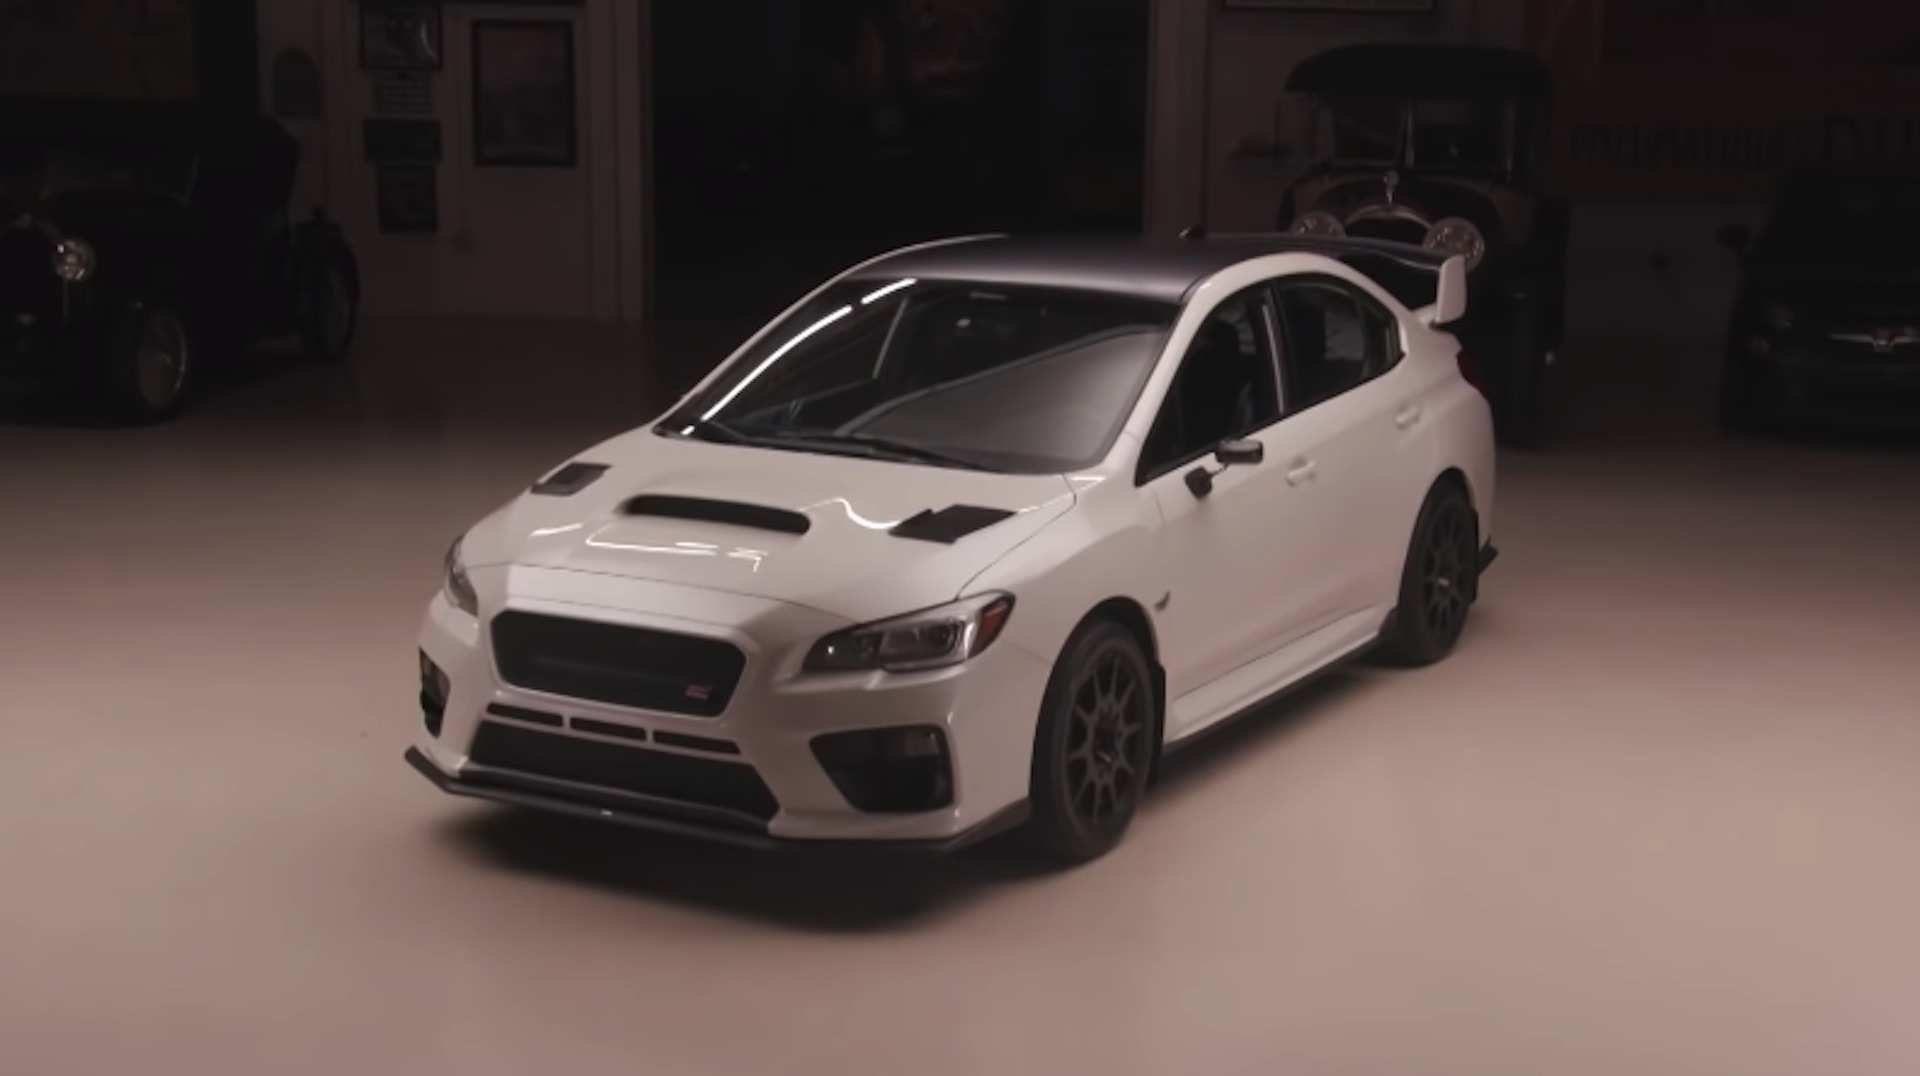 2021 Subaru Wrx Sti Specs In 2020 Subaru Brz Sti Subaru Brz Subaru Wrx